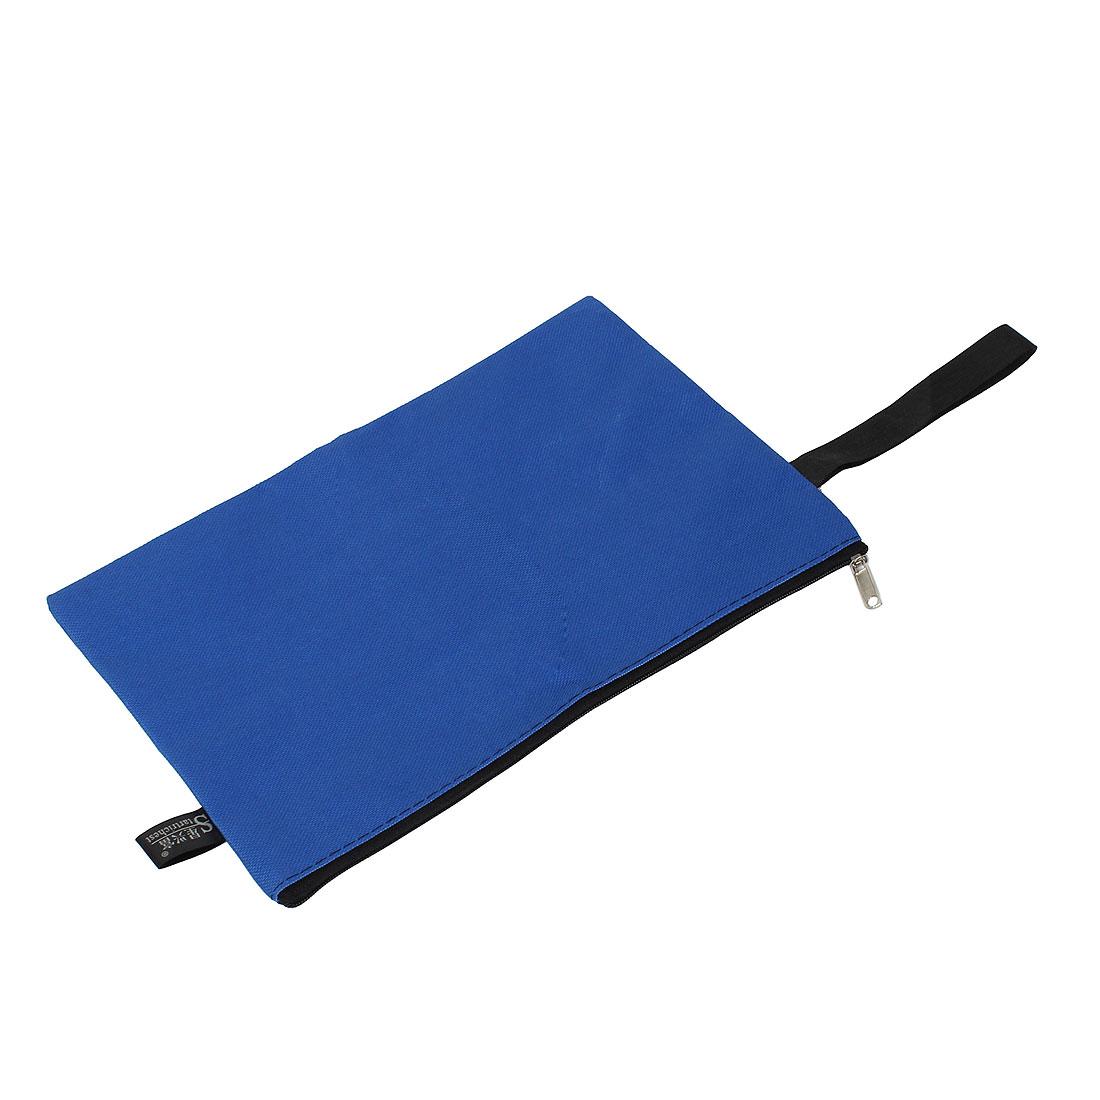 Office School Zipper Closure A5 Paper Document File Pen Bag Holder Organizer Pouch Blue w Strap